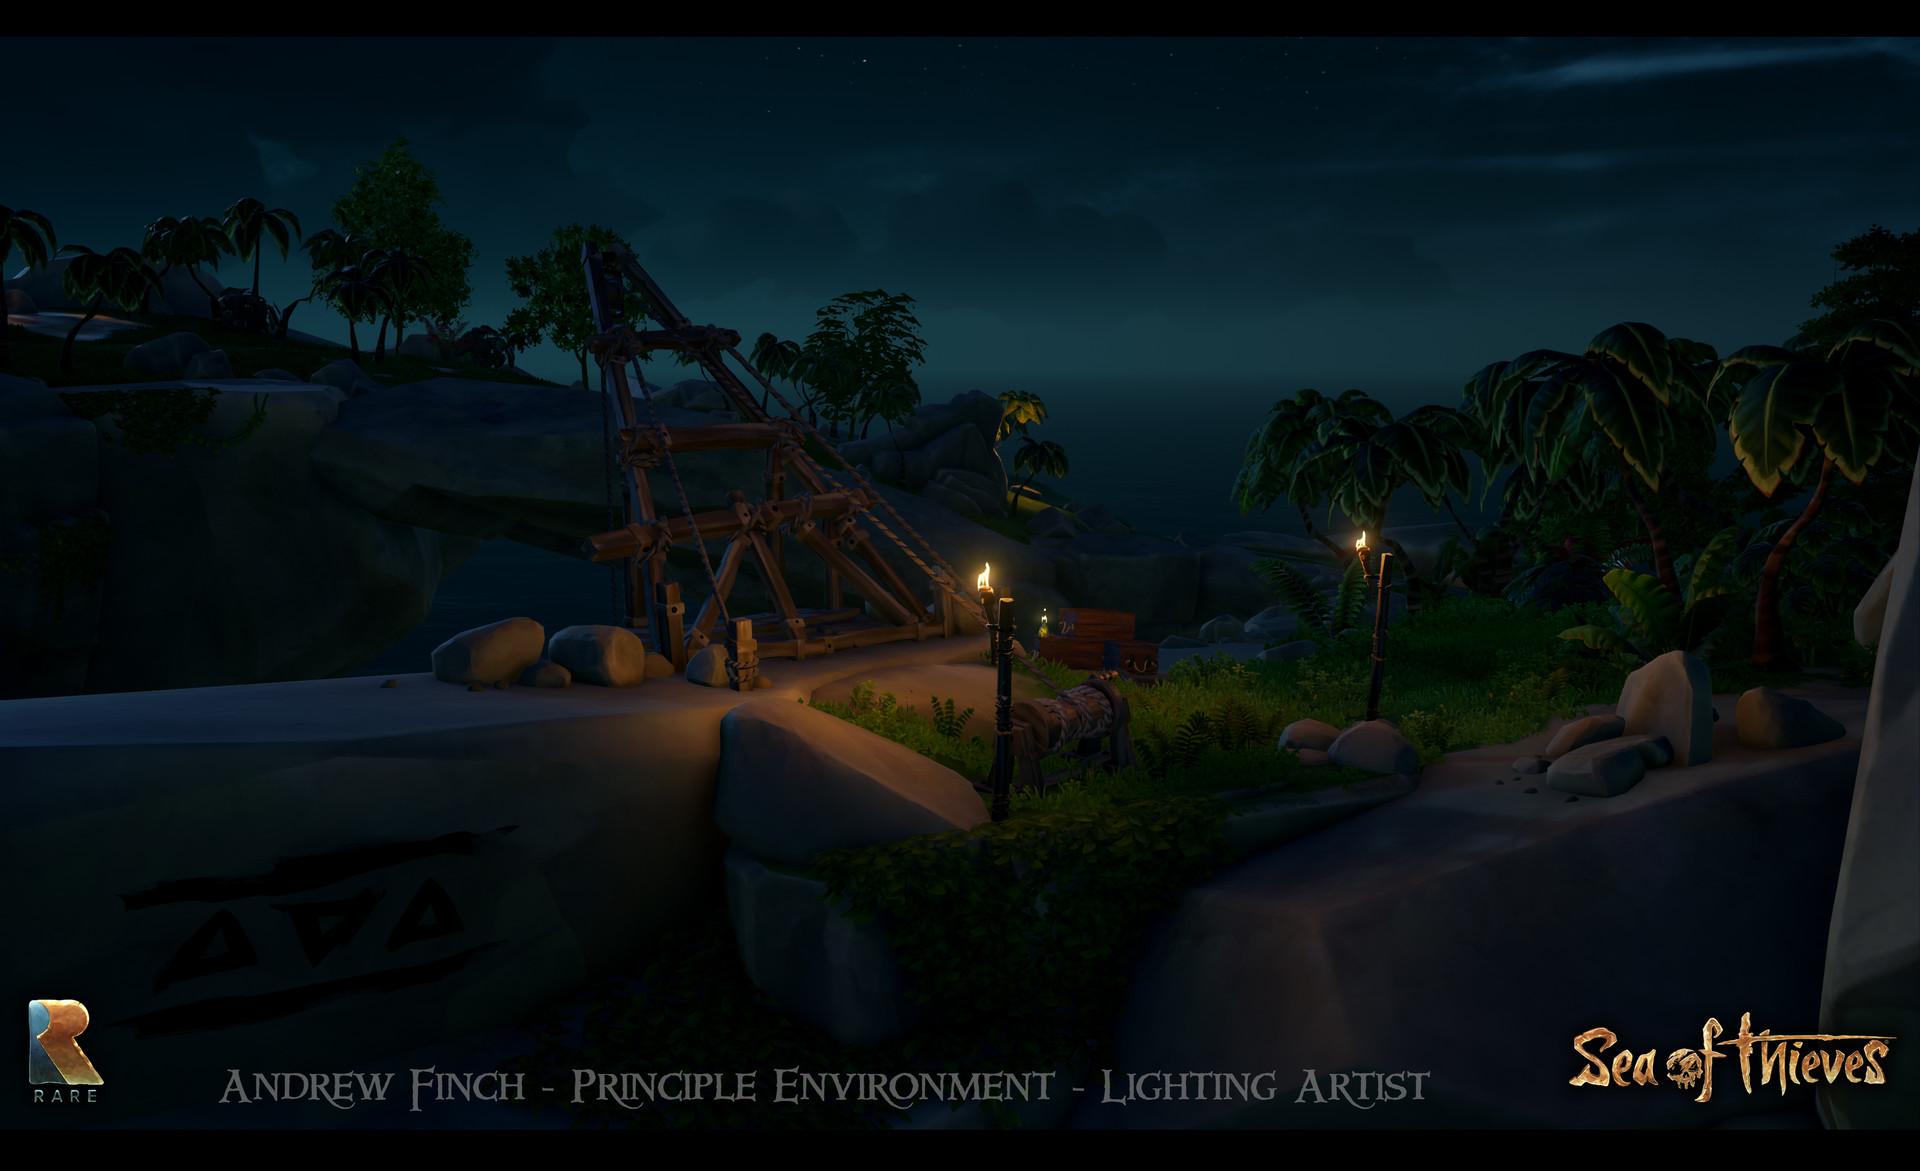 Andrew finch island lighting 34